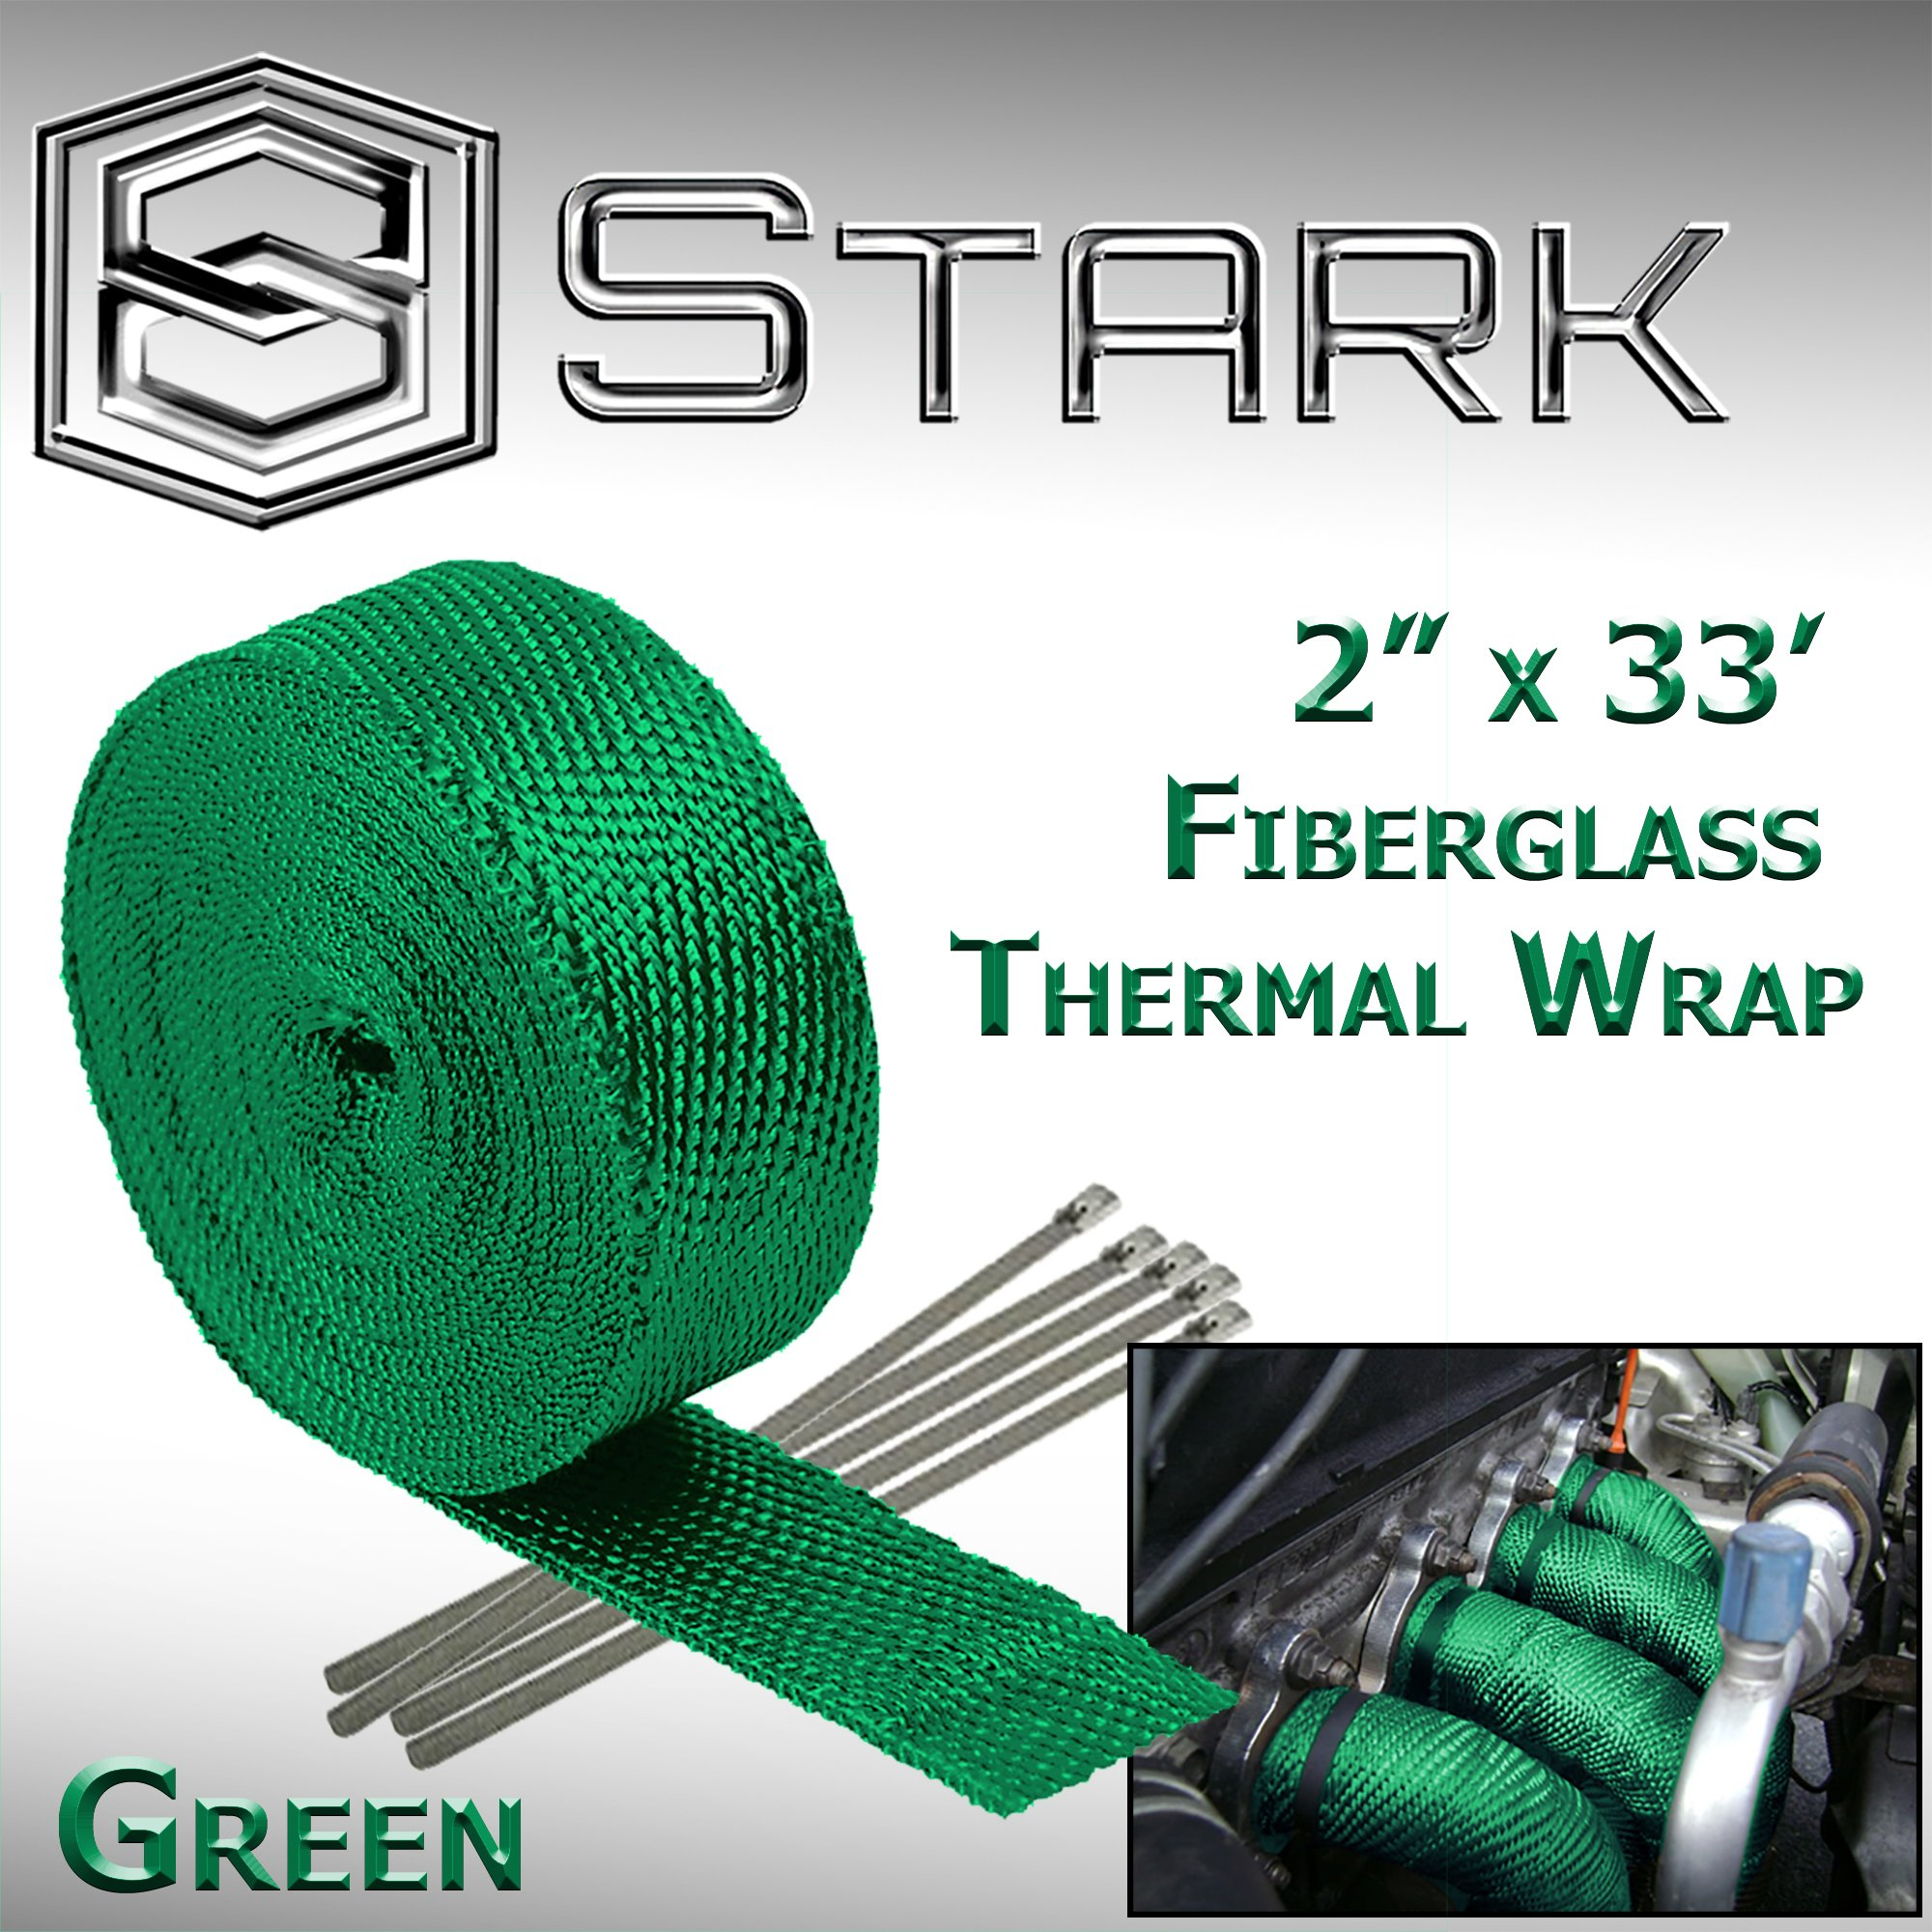 Stark Thermal Wrap 2'' Wide x 33' Long - Fiberglass Heat Shield Exhaust Manifold/Header Wrap - Green